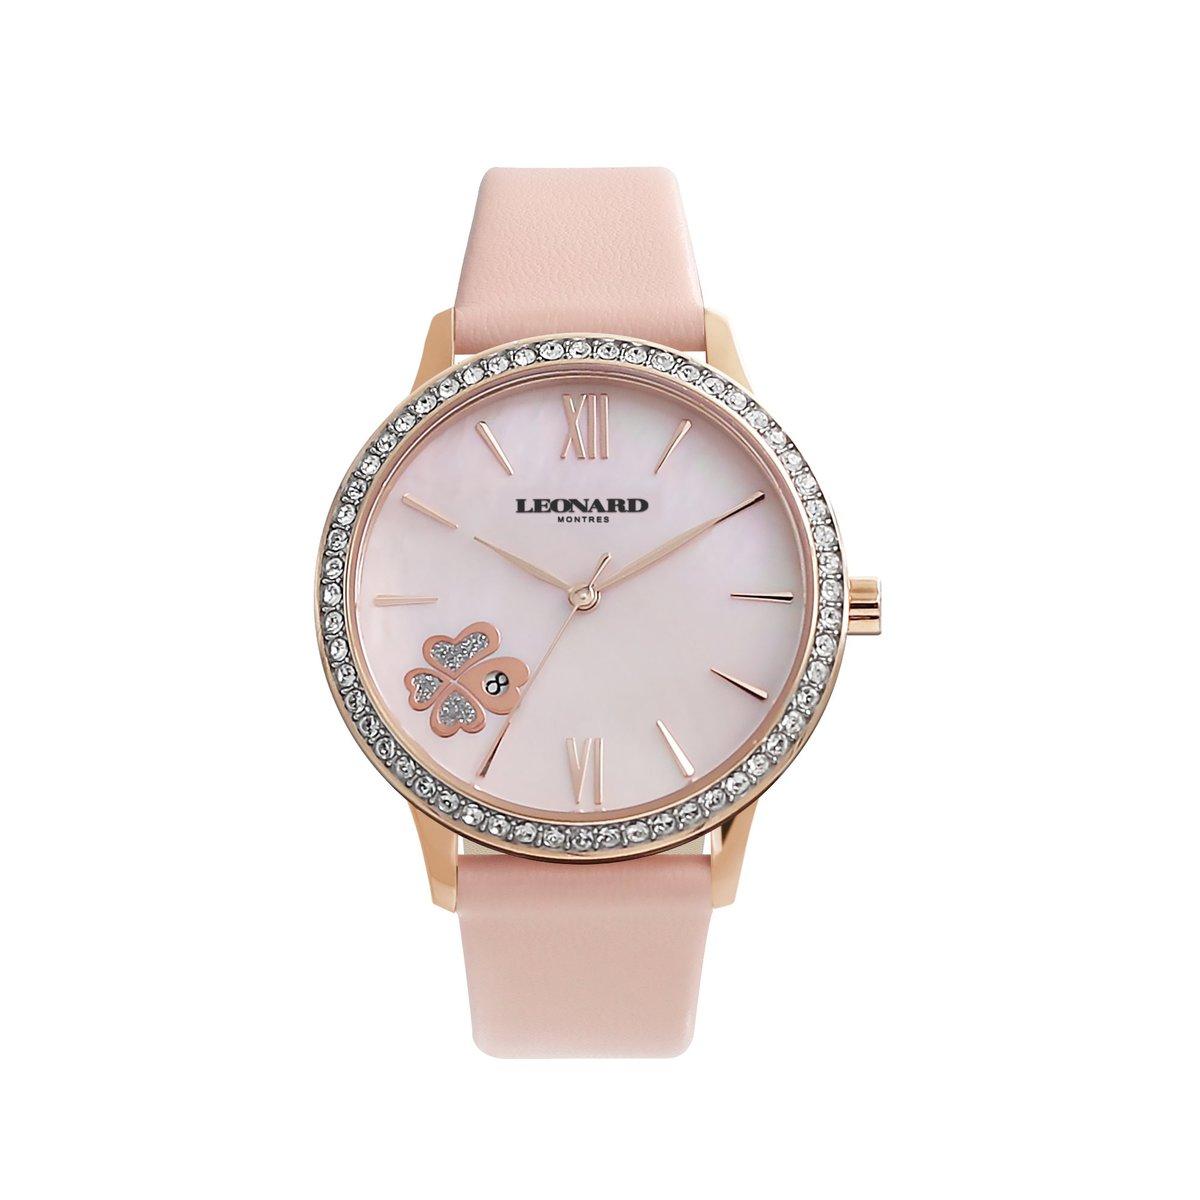 經典水晶腕錶 LLF1021-26R